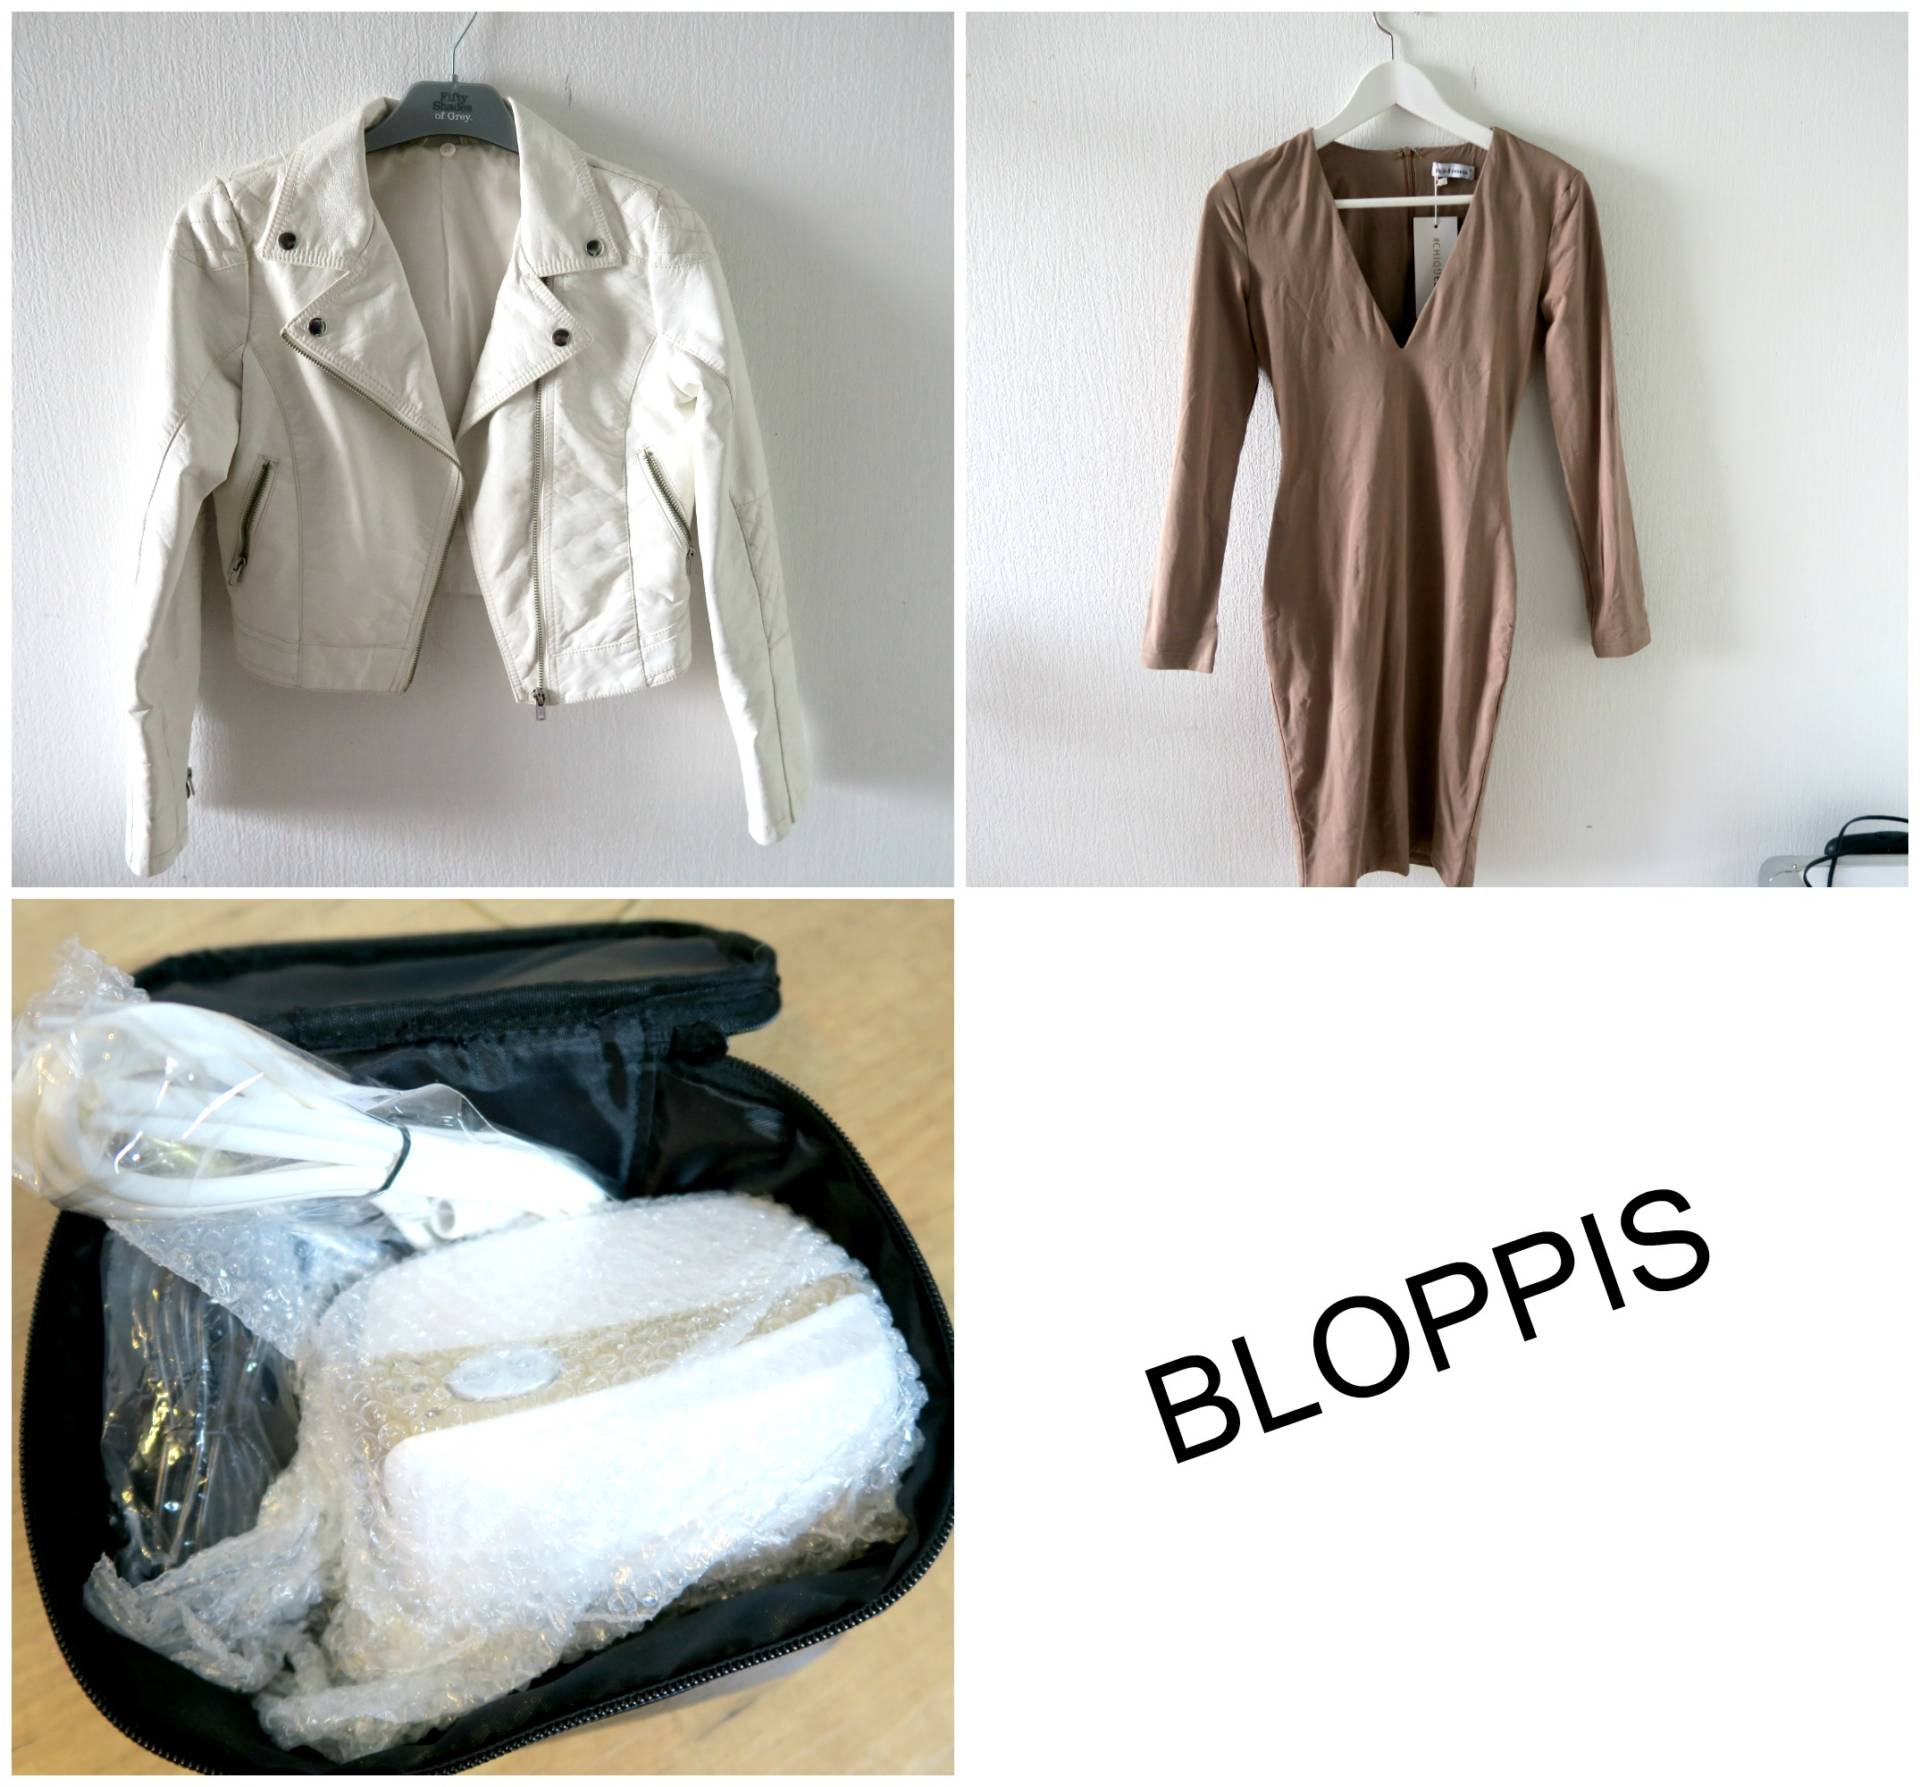 bloppis